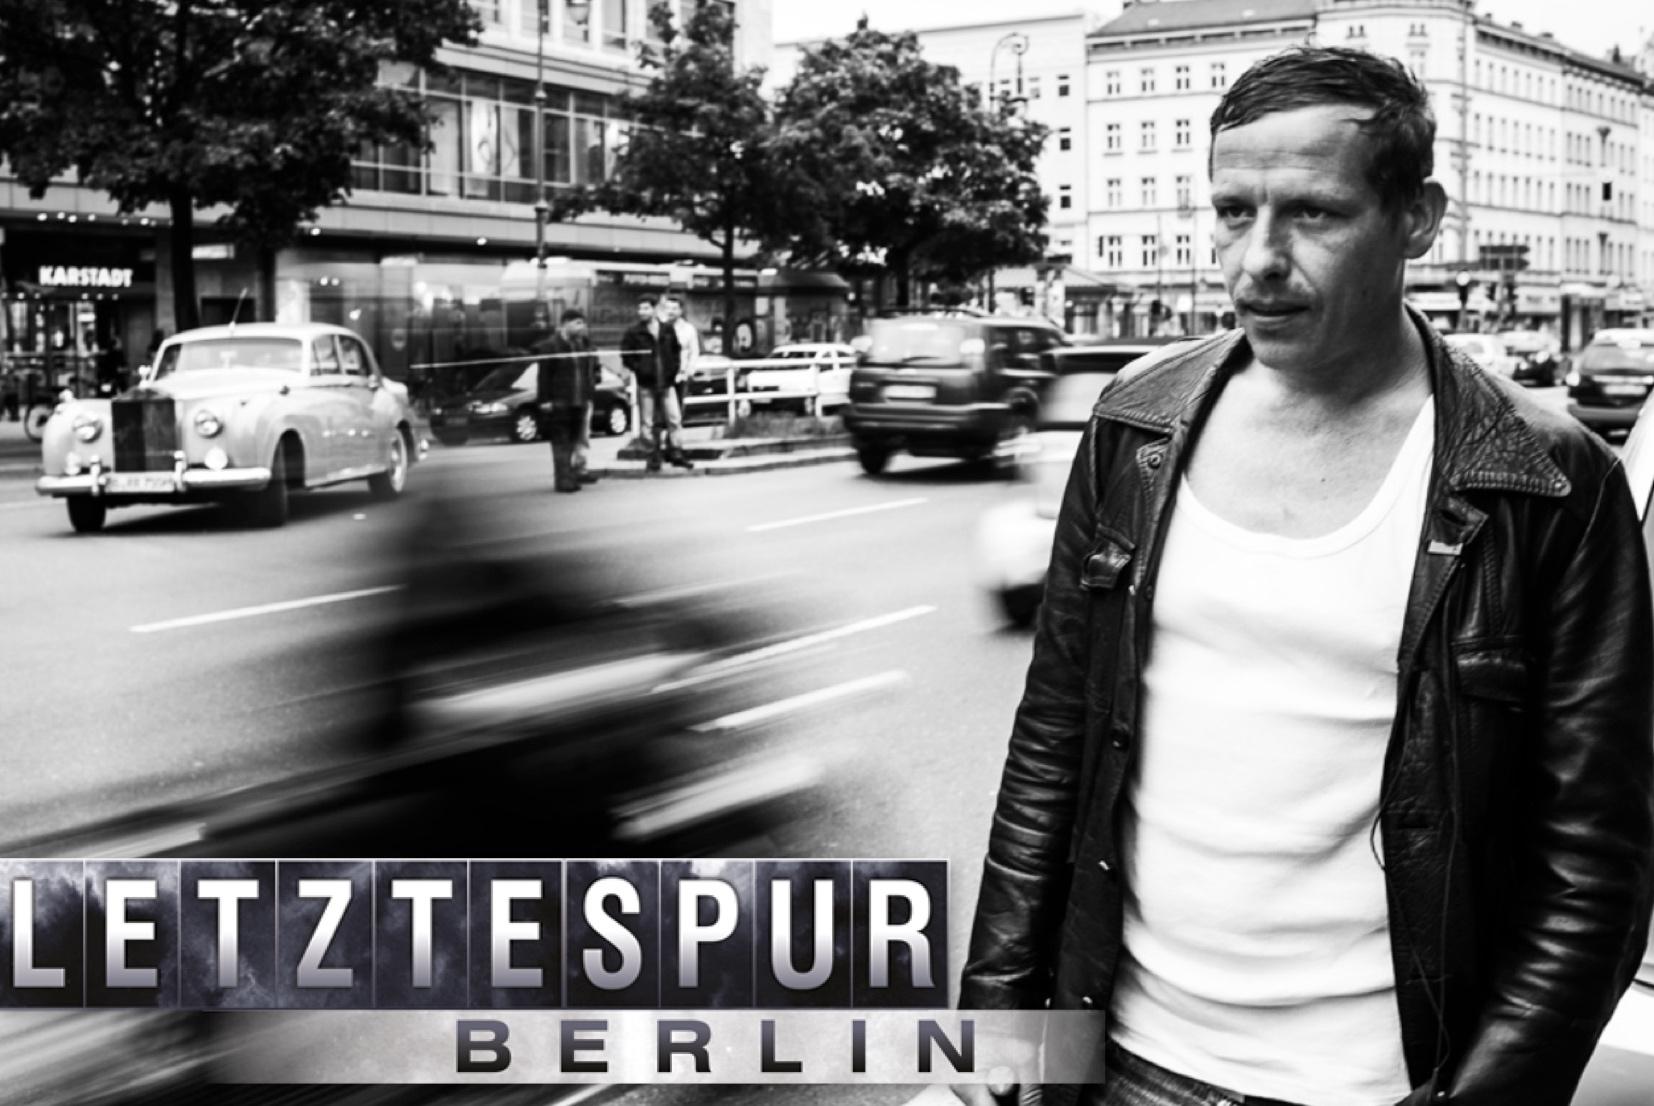 letzte spur berlin sheriff 2017